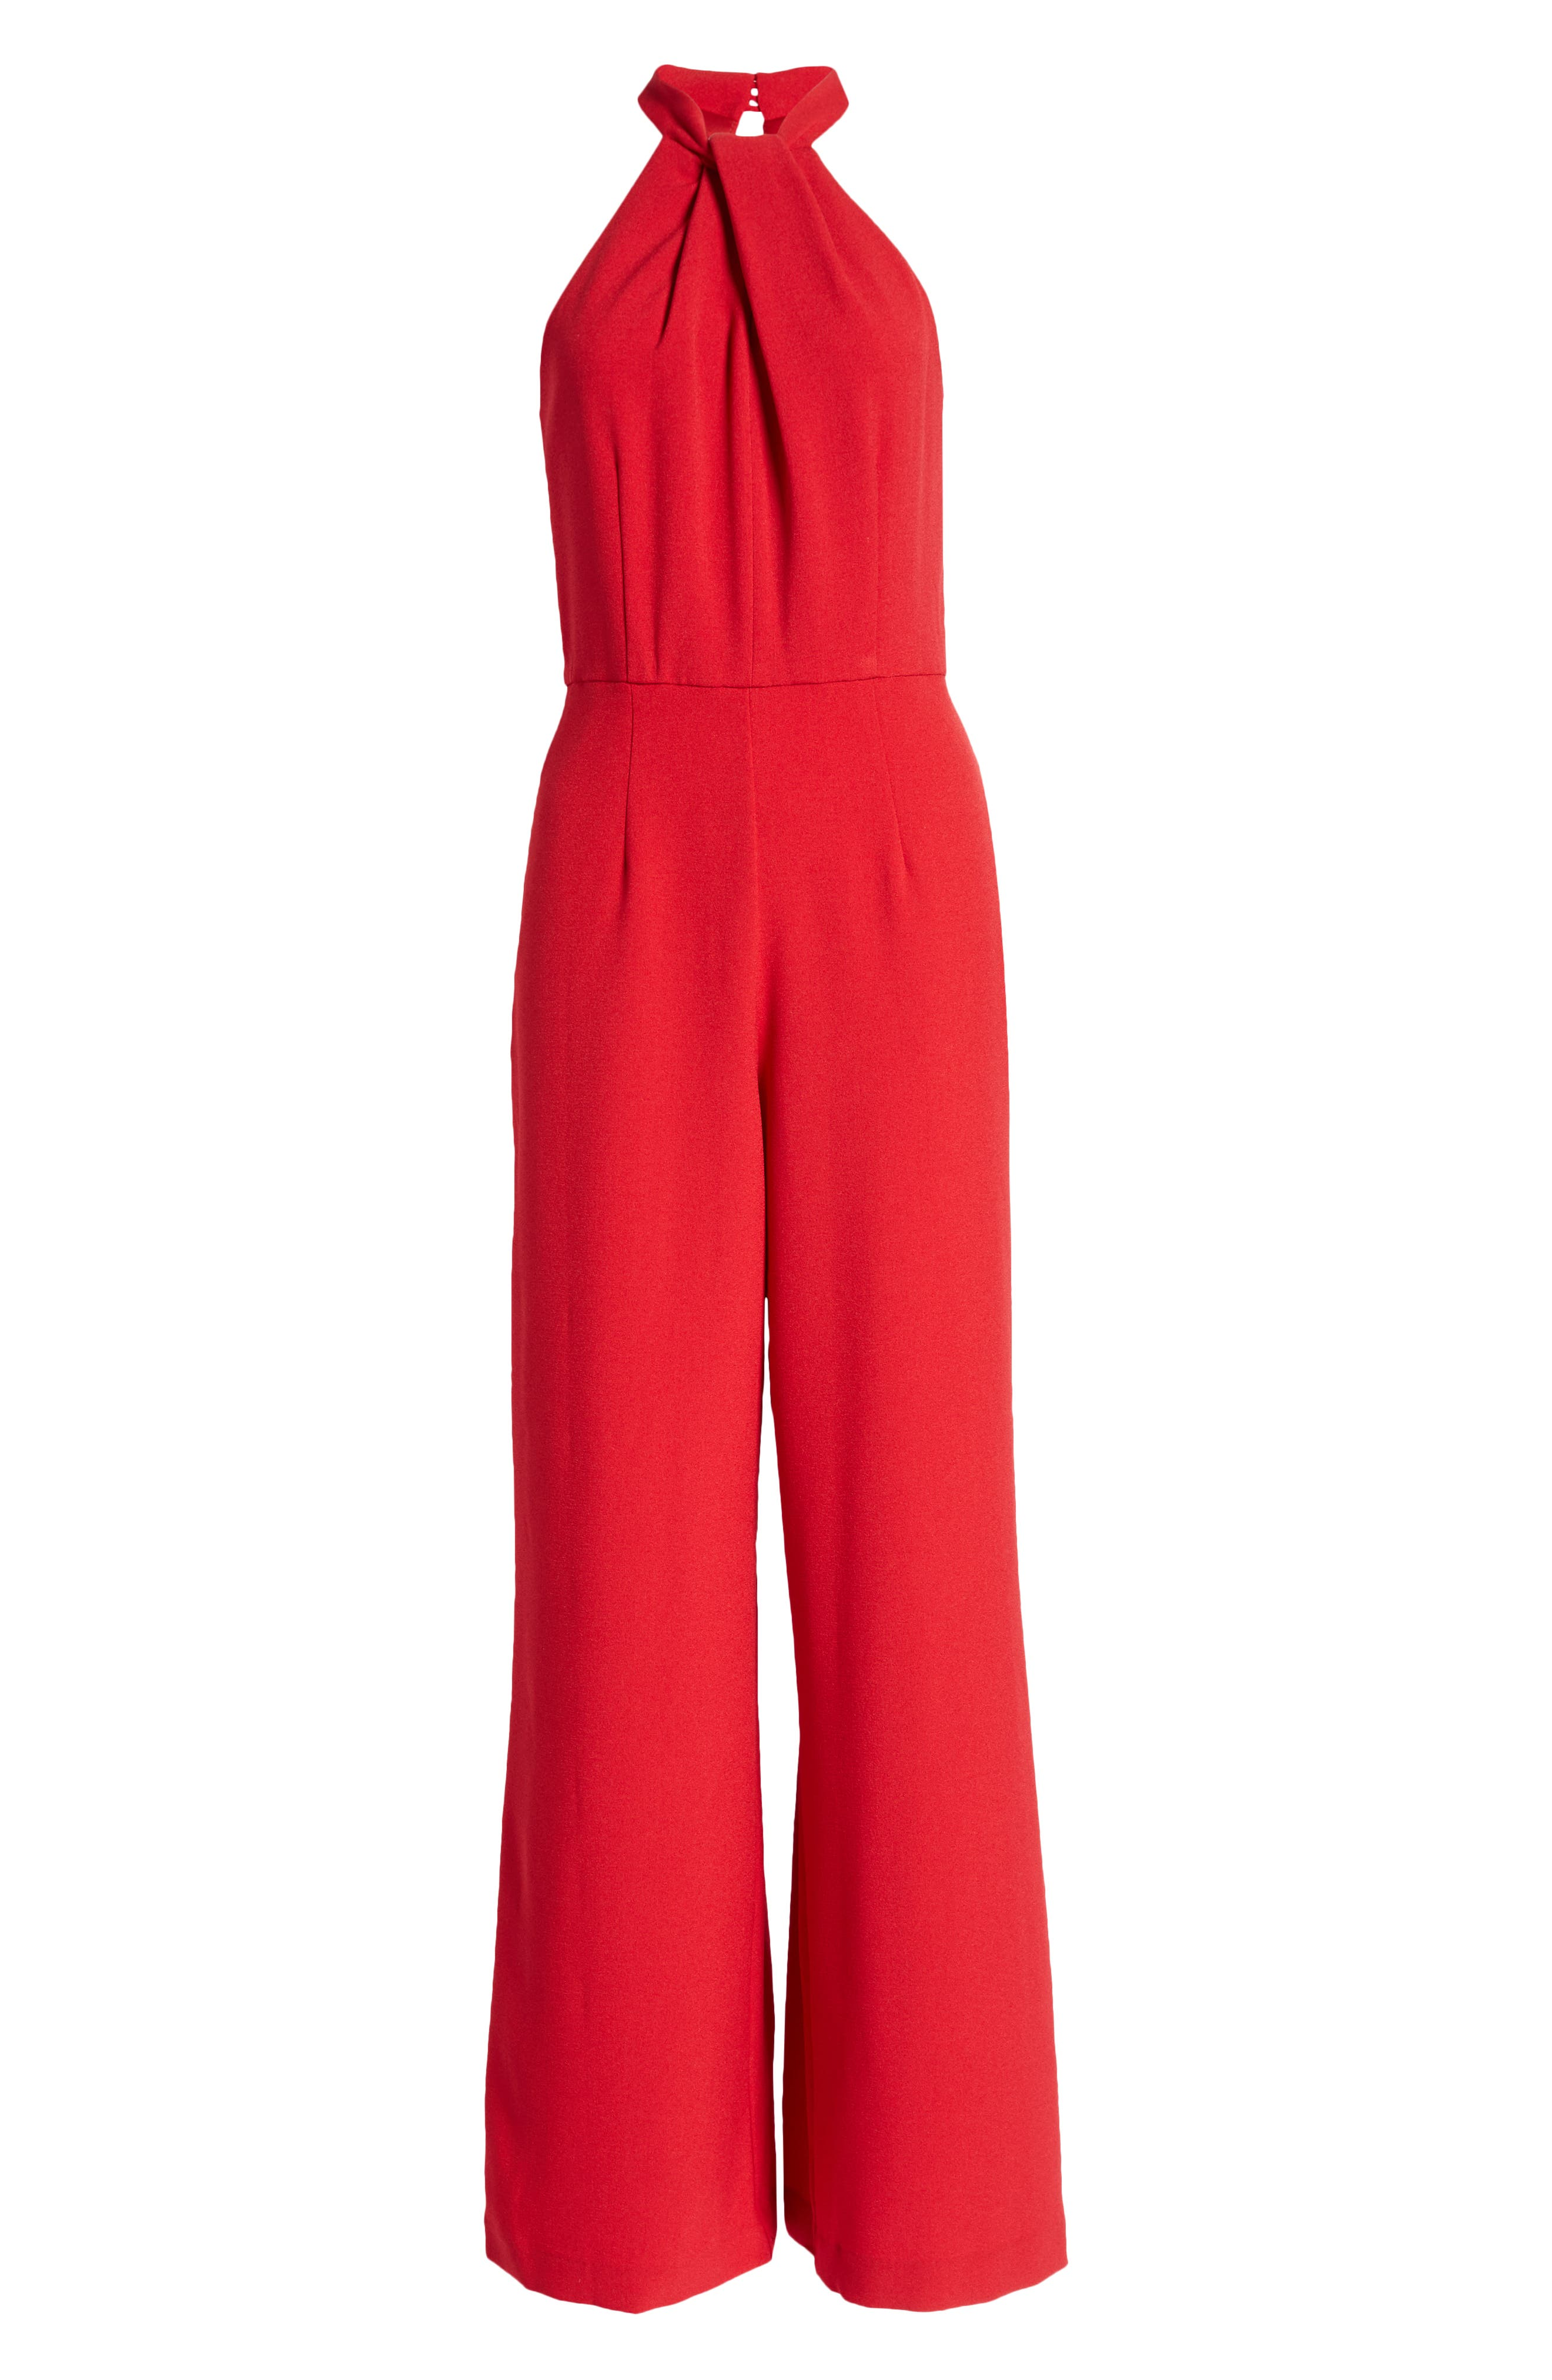 60s – 70s Pants, Jeans, Hippie, Bell Bottoms, Jumpsuits Womens Julia Jordan Halter Neck Jumpsuit Size 14 - Red $139.00 AT vintagedancer.com